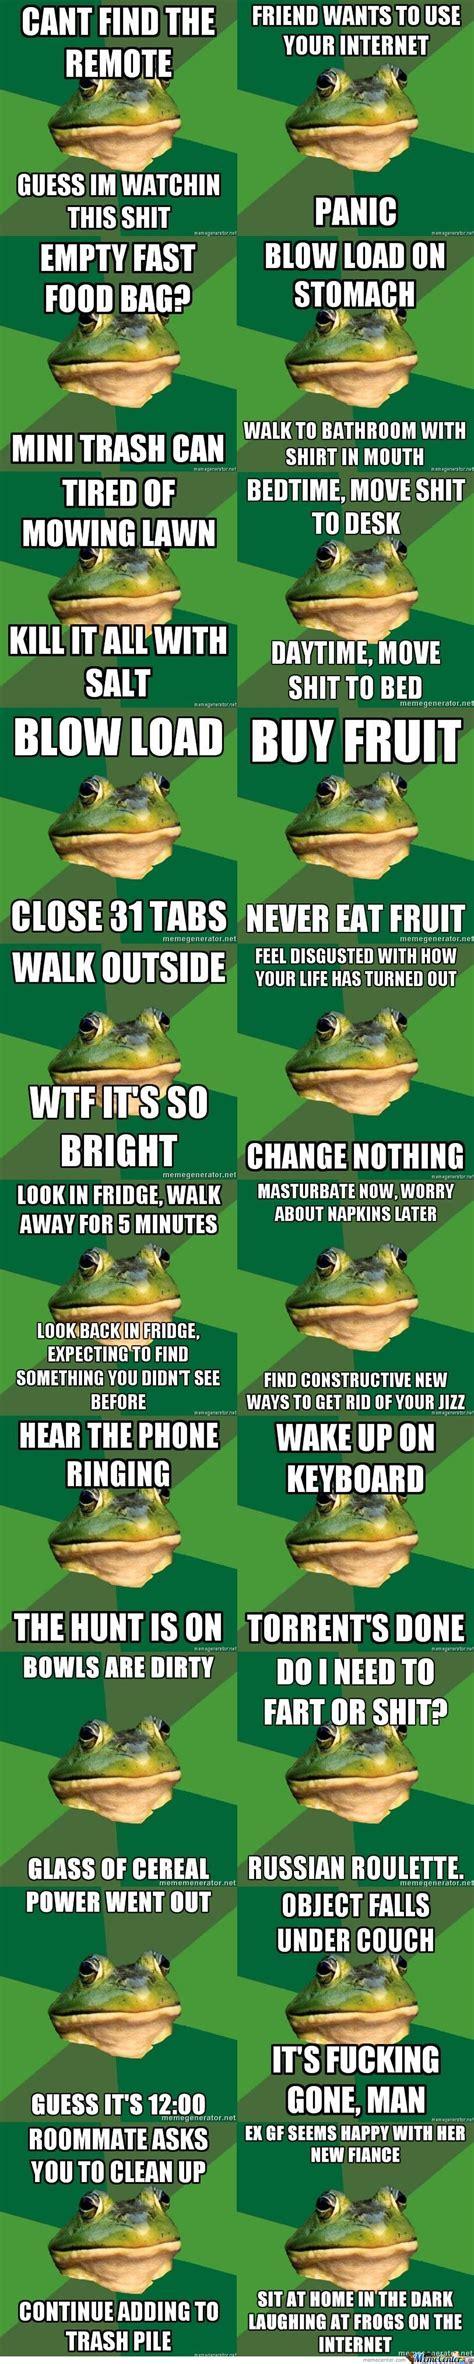 Fbf Meme - fbf by mikibrisfors meme center